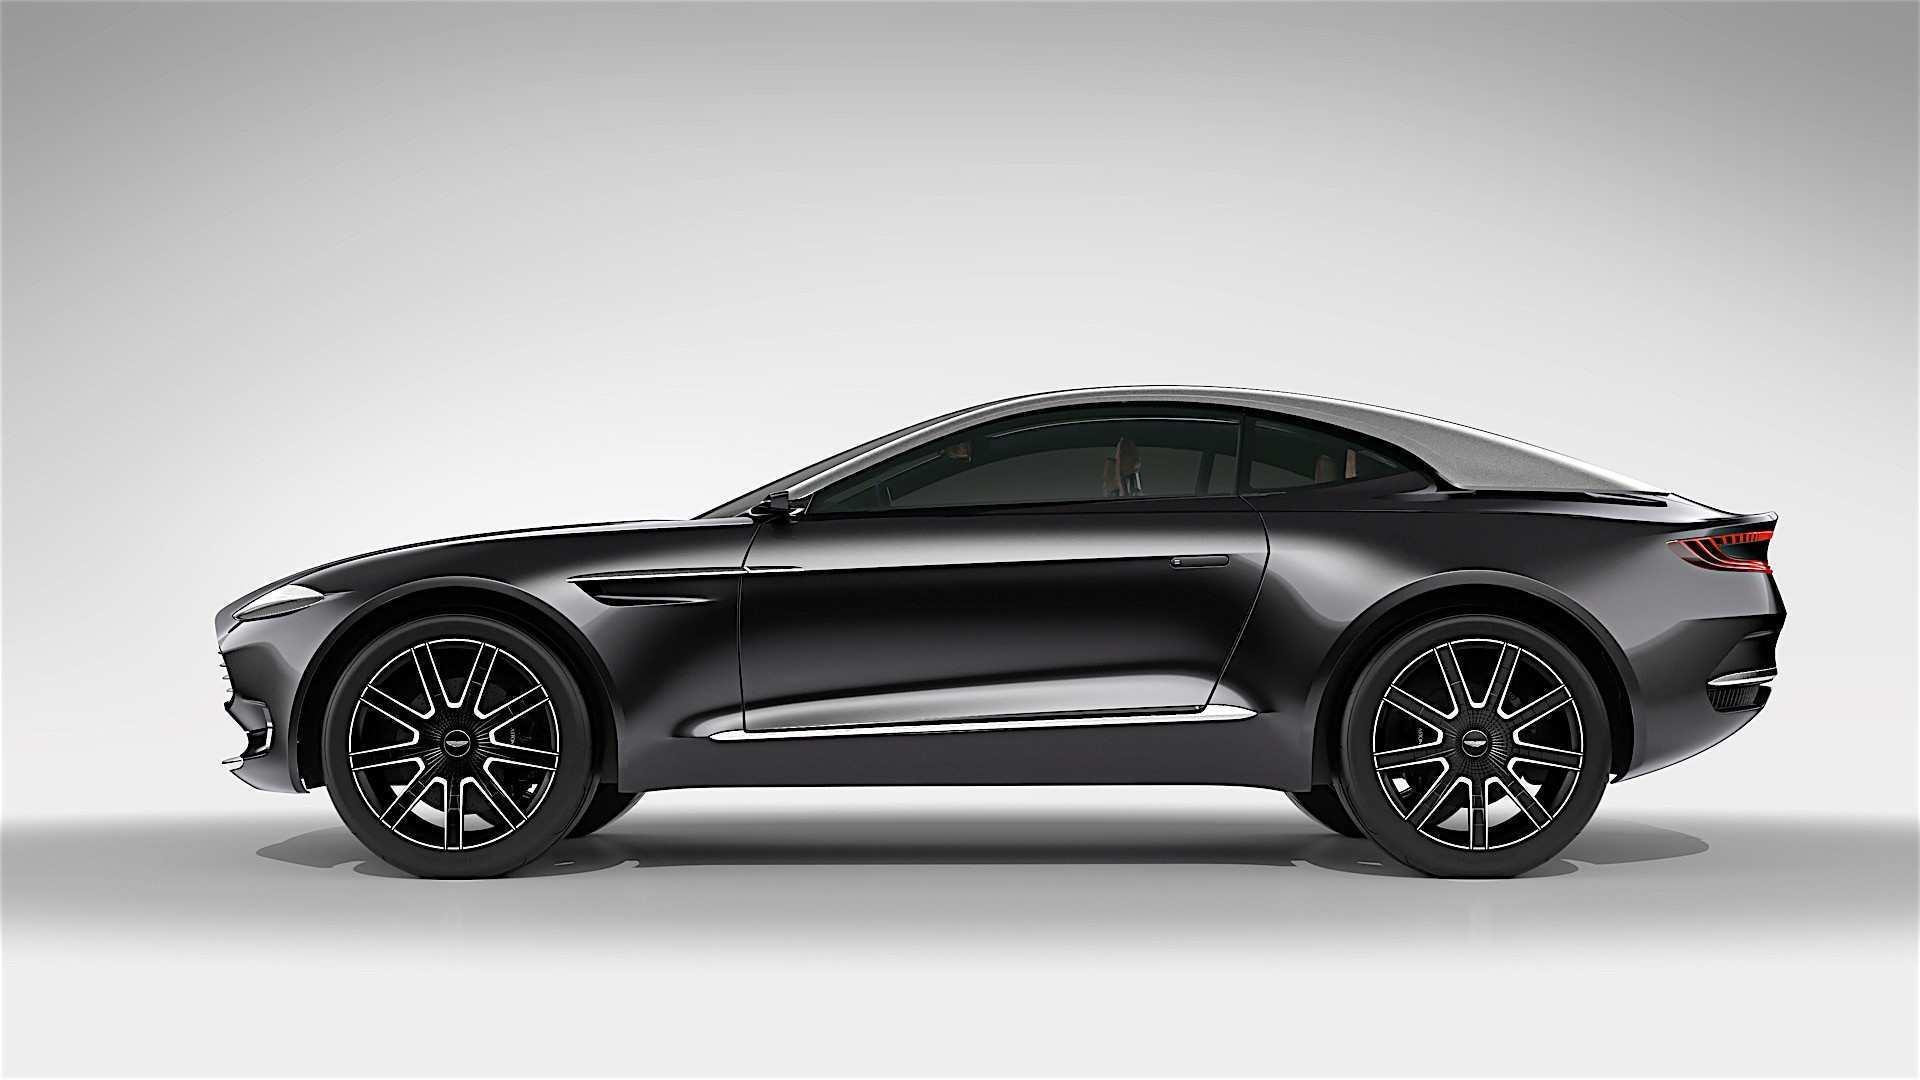 86 New 2019 Aston Martin Suv Performance and New Engine by 2019 Aston Martin Suv